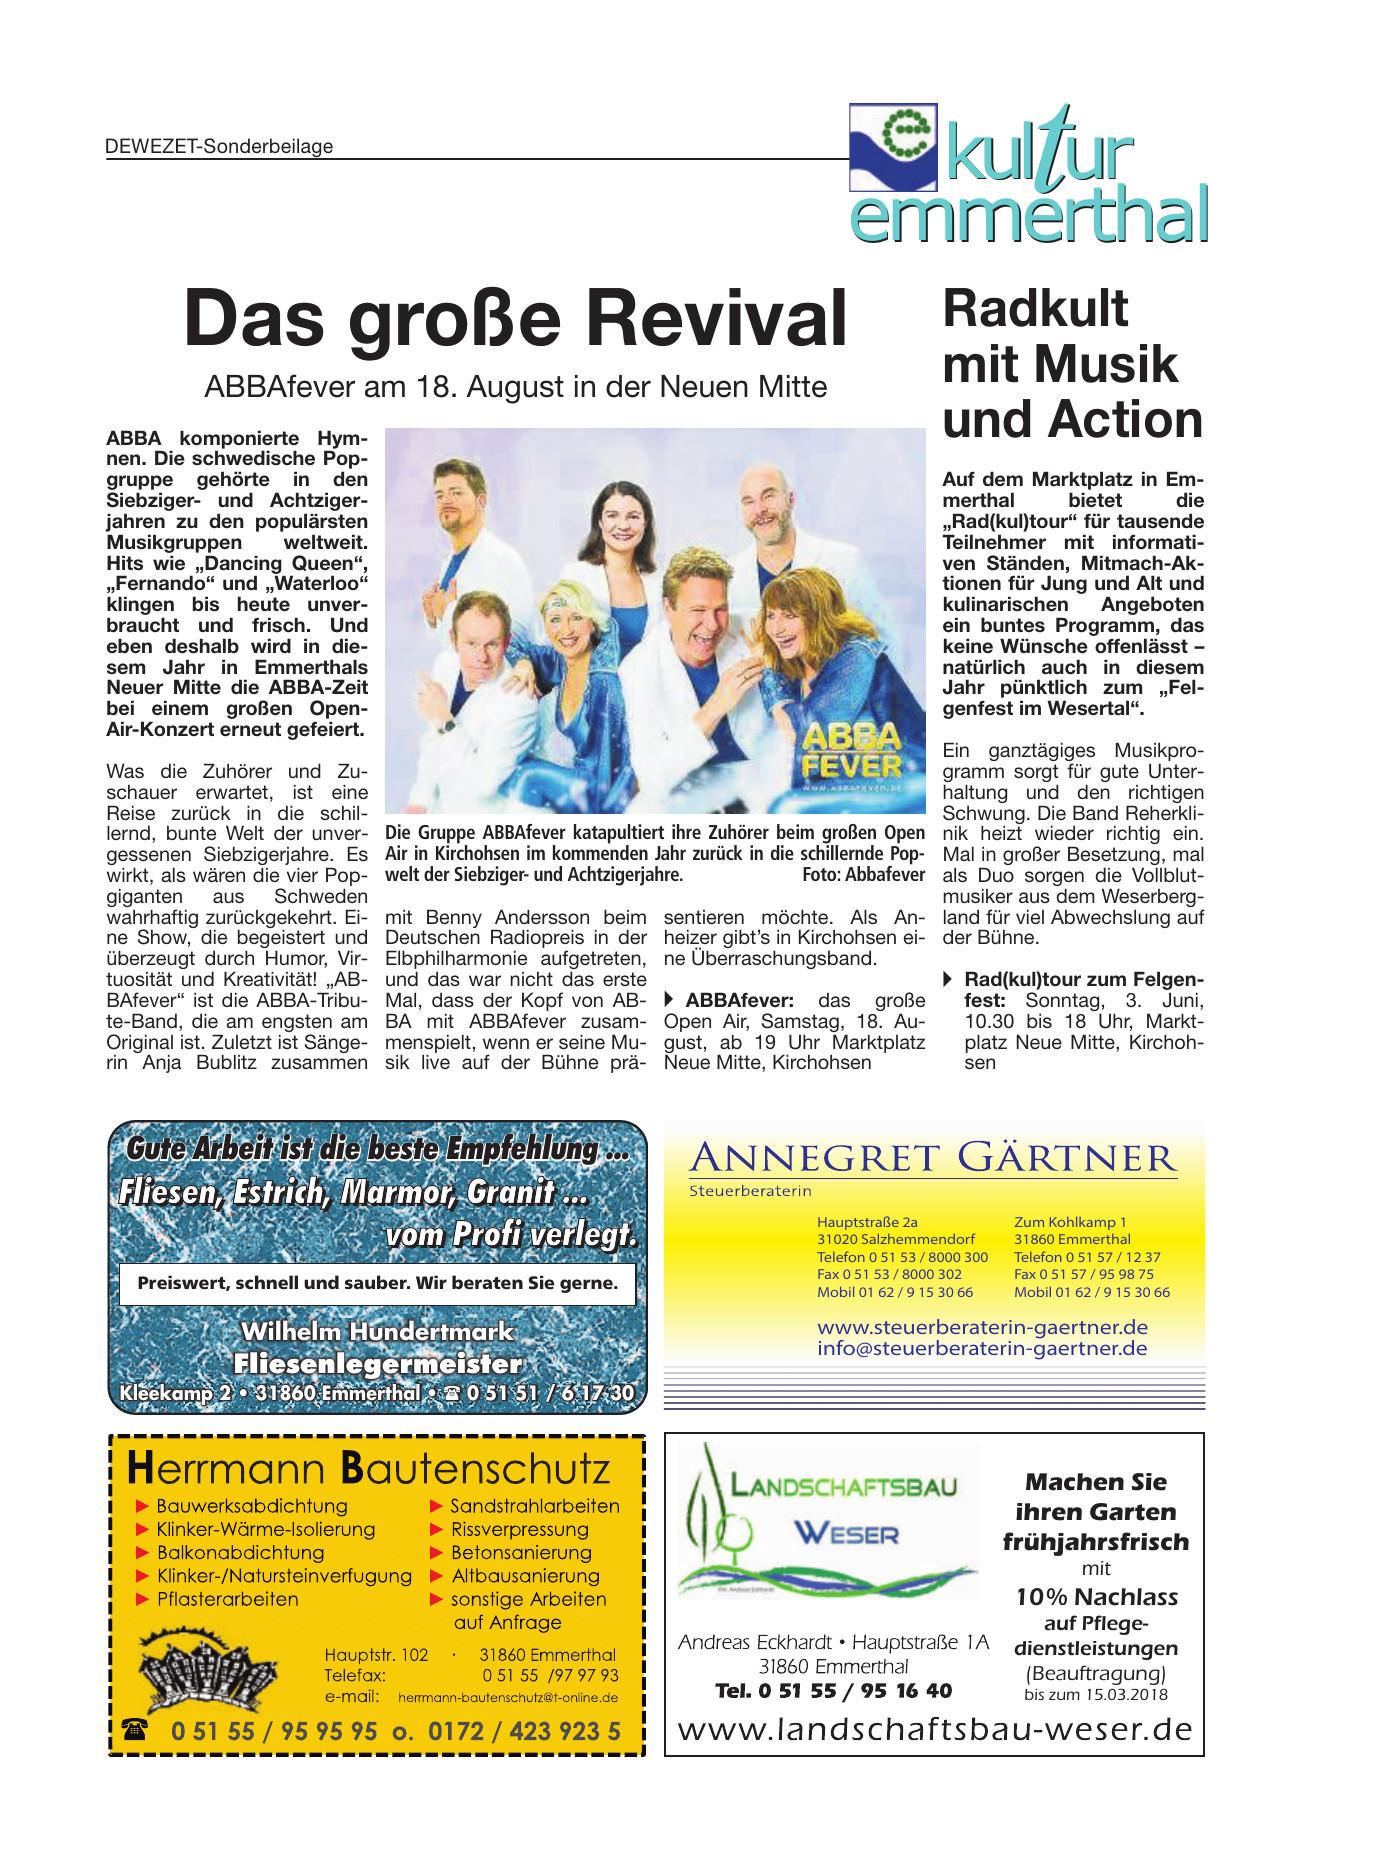 Dwz217 Tabdwz Kultur 180222 005 005 Jpg